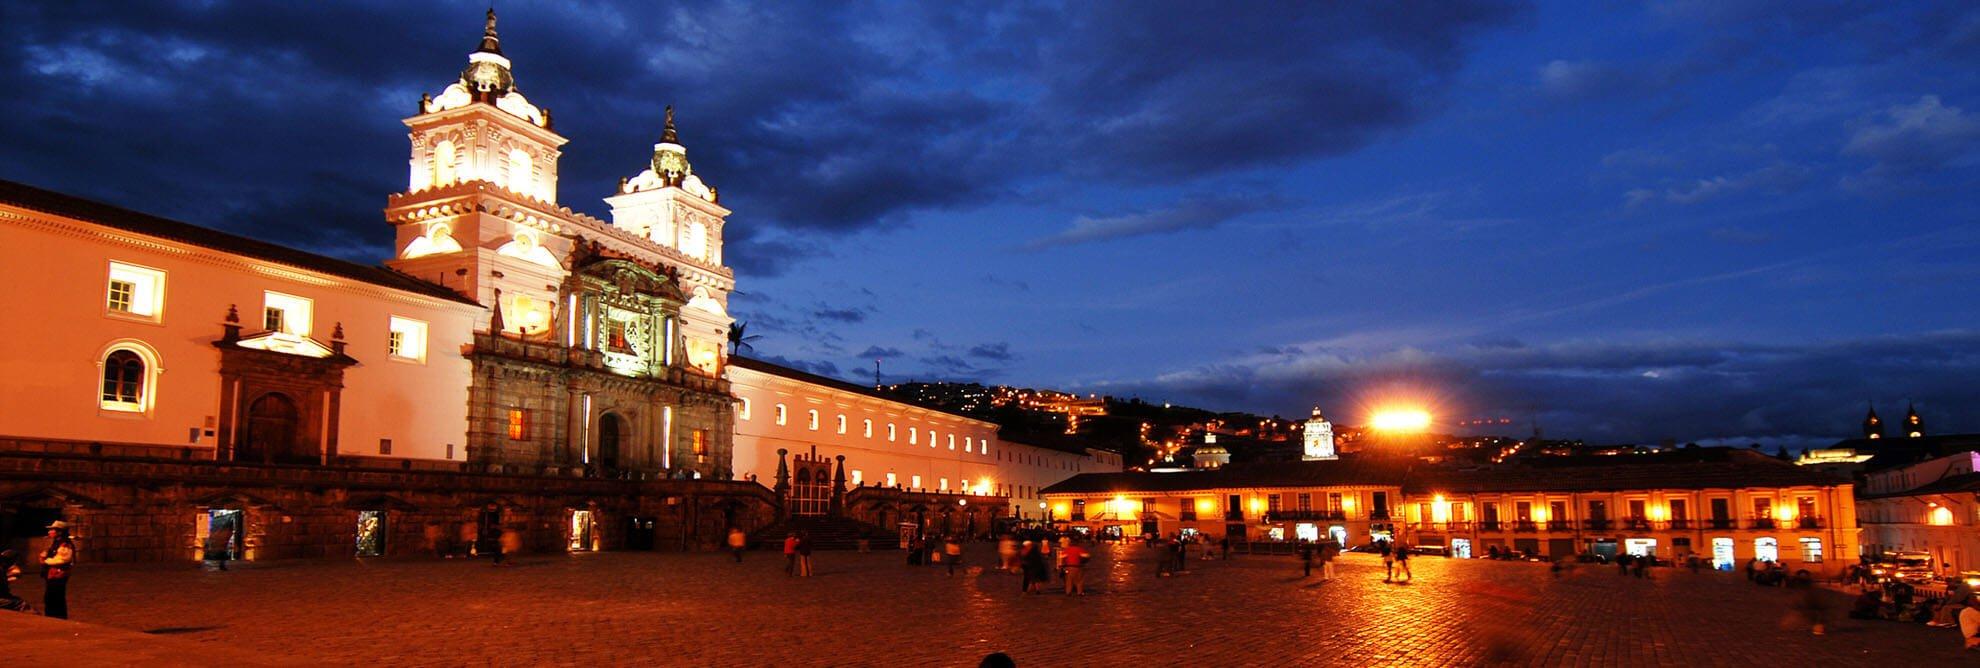 Quito - Ecuador Sehenswürdigkeiten